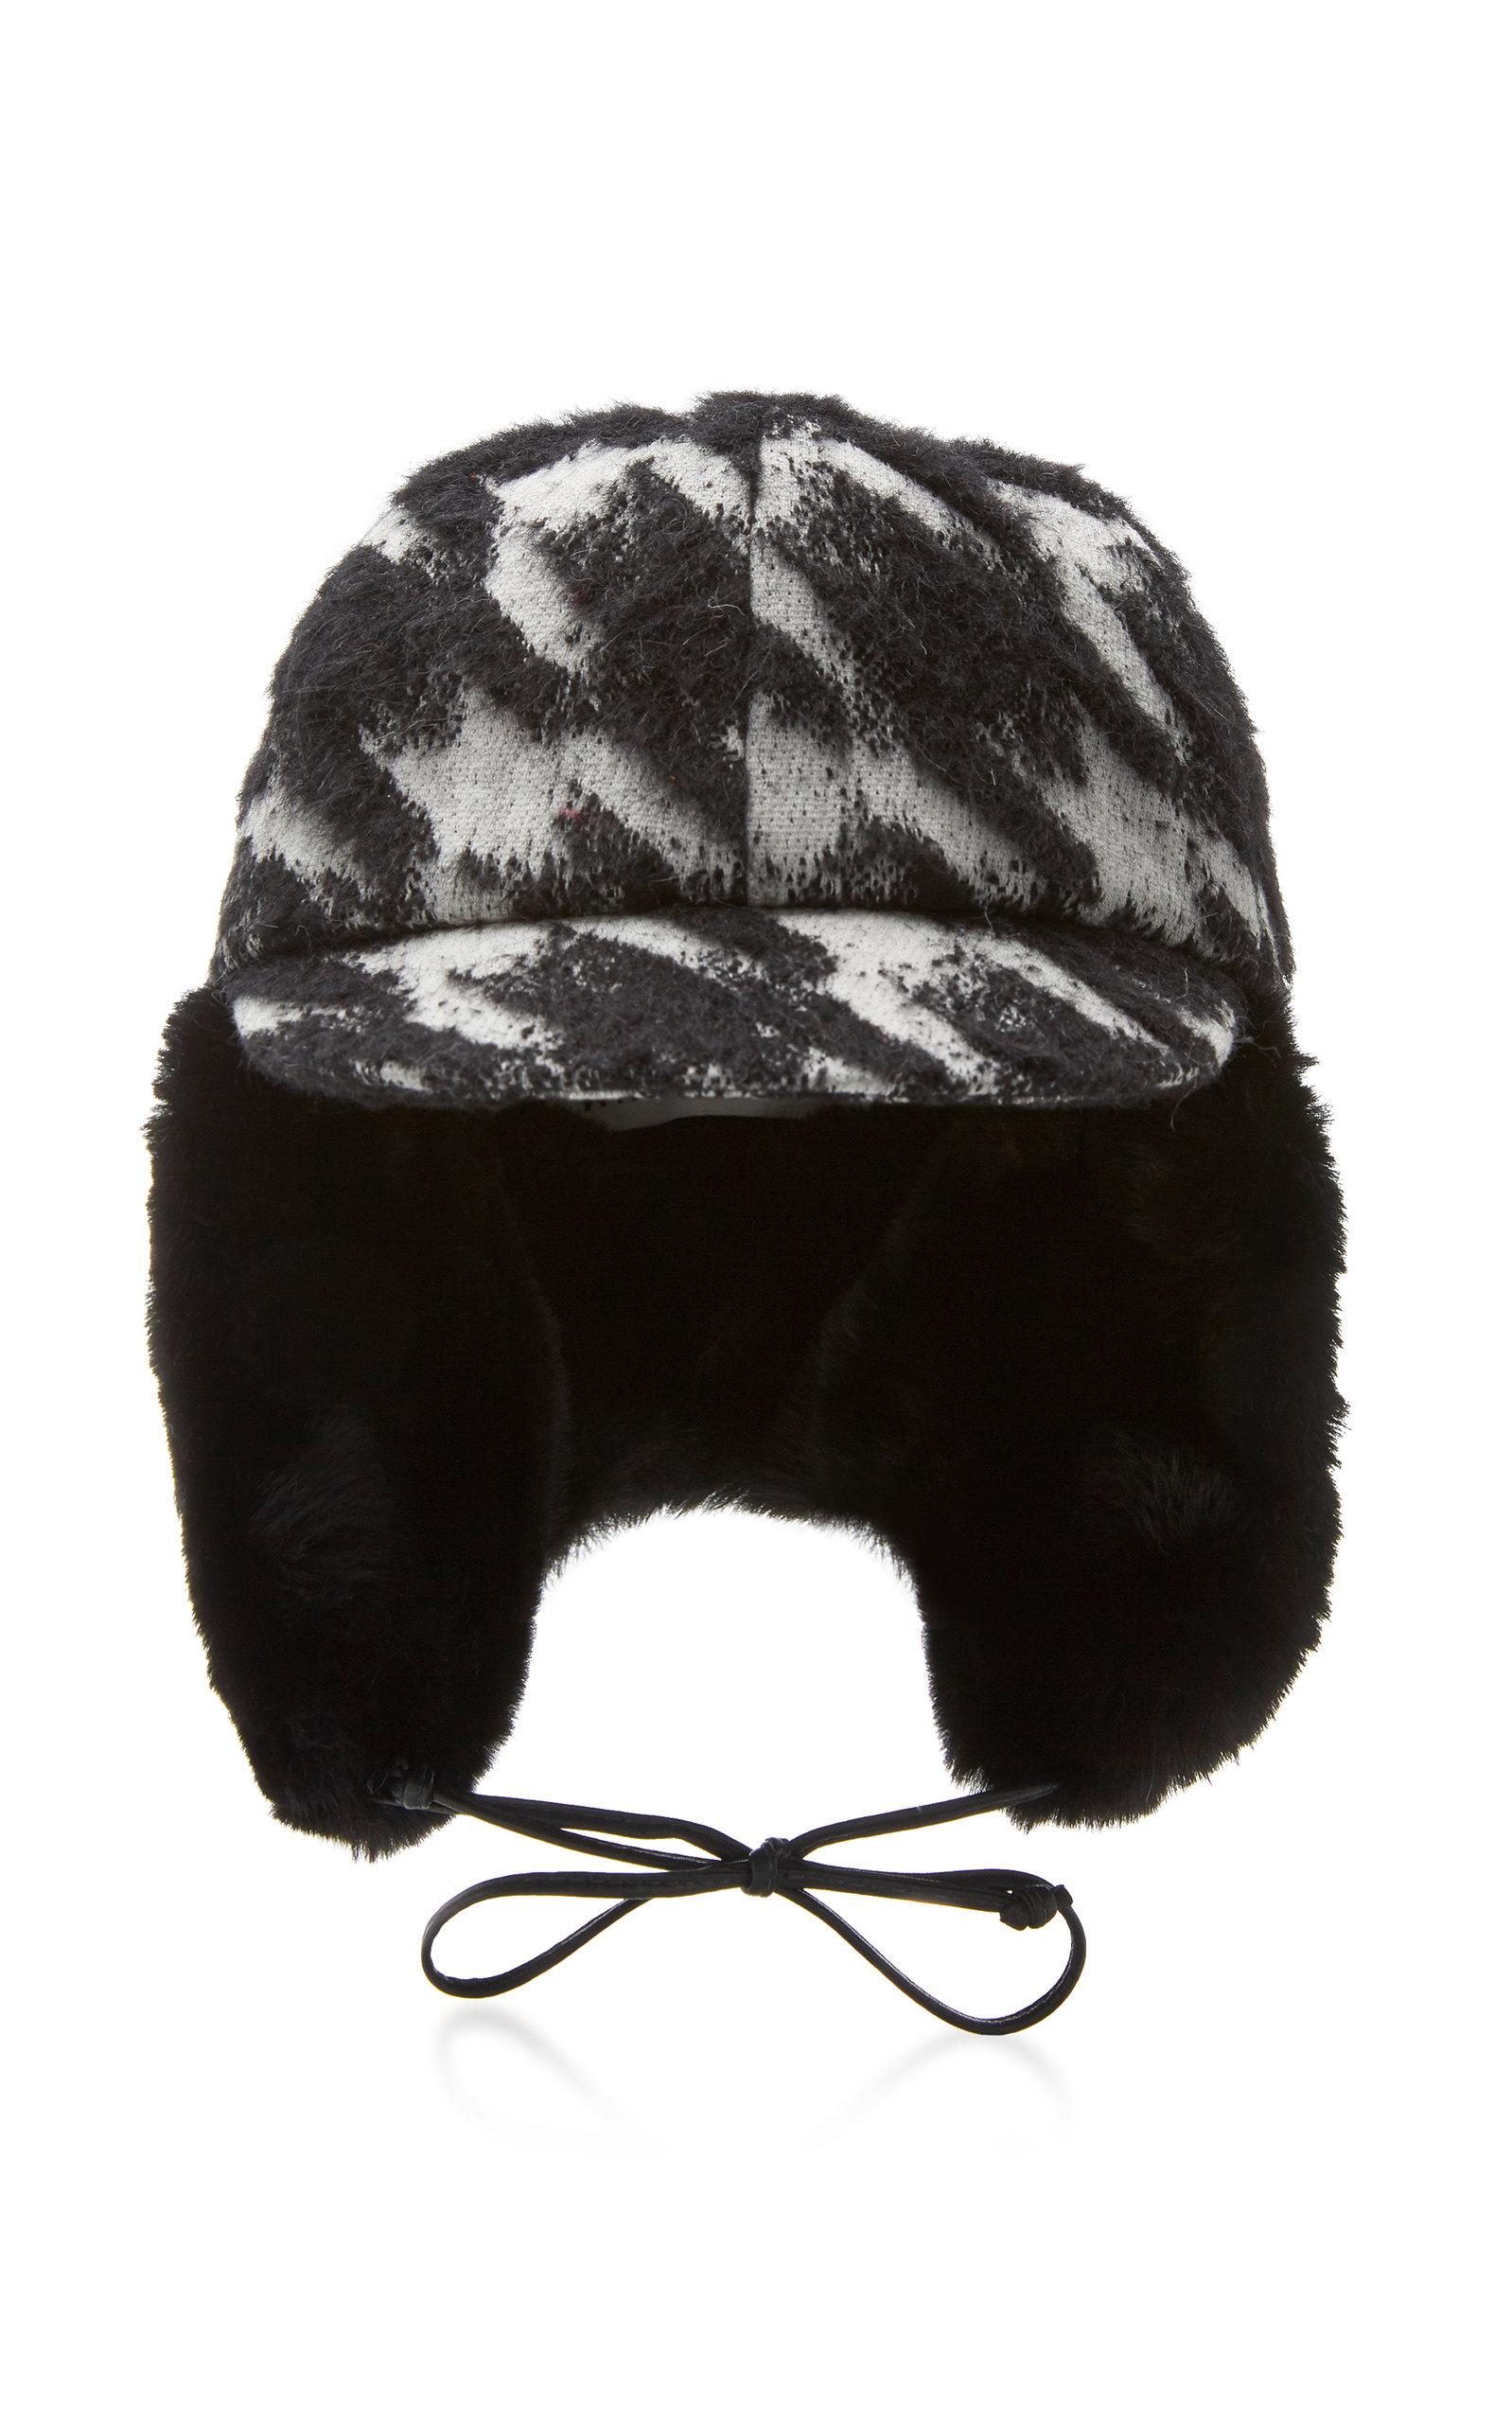 9d00f78afb1 Eugenia KimSammy Herringbone Trapper Hat. CLOSE. Loading